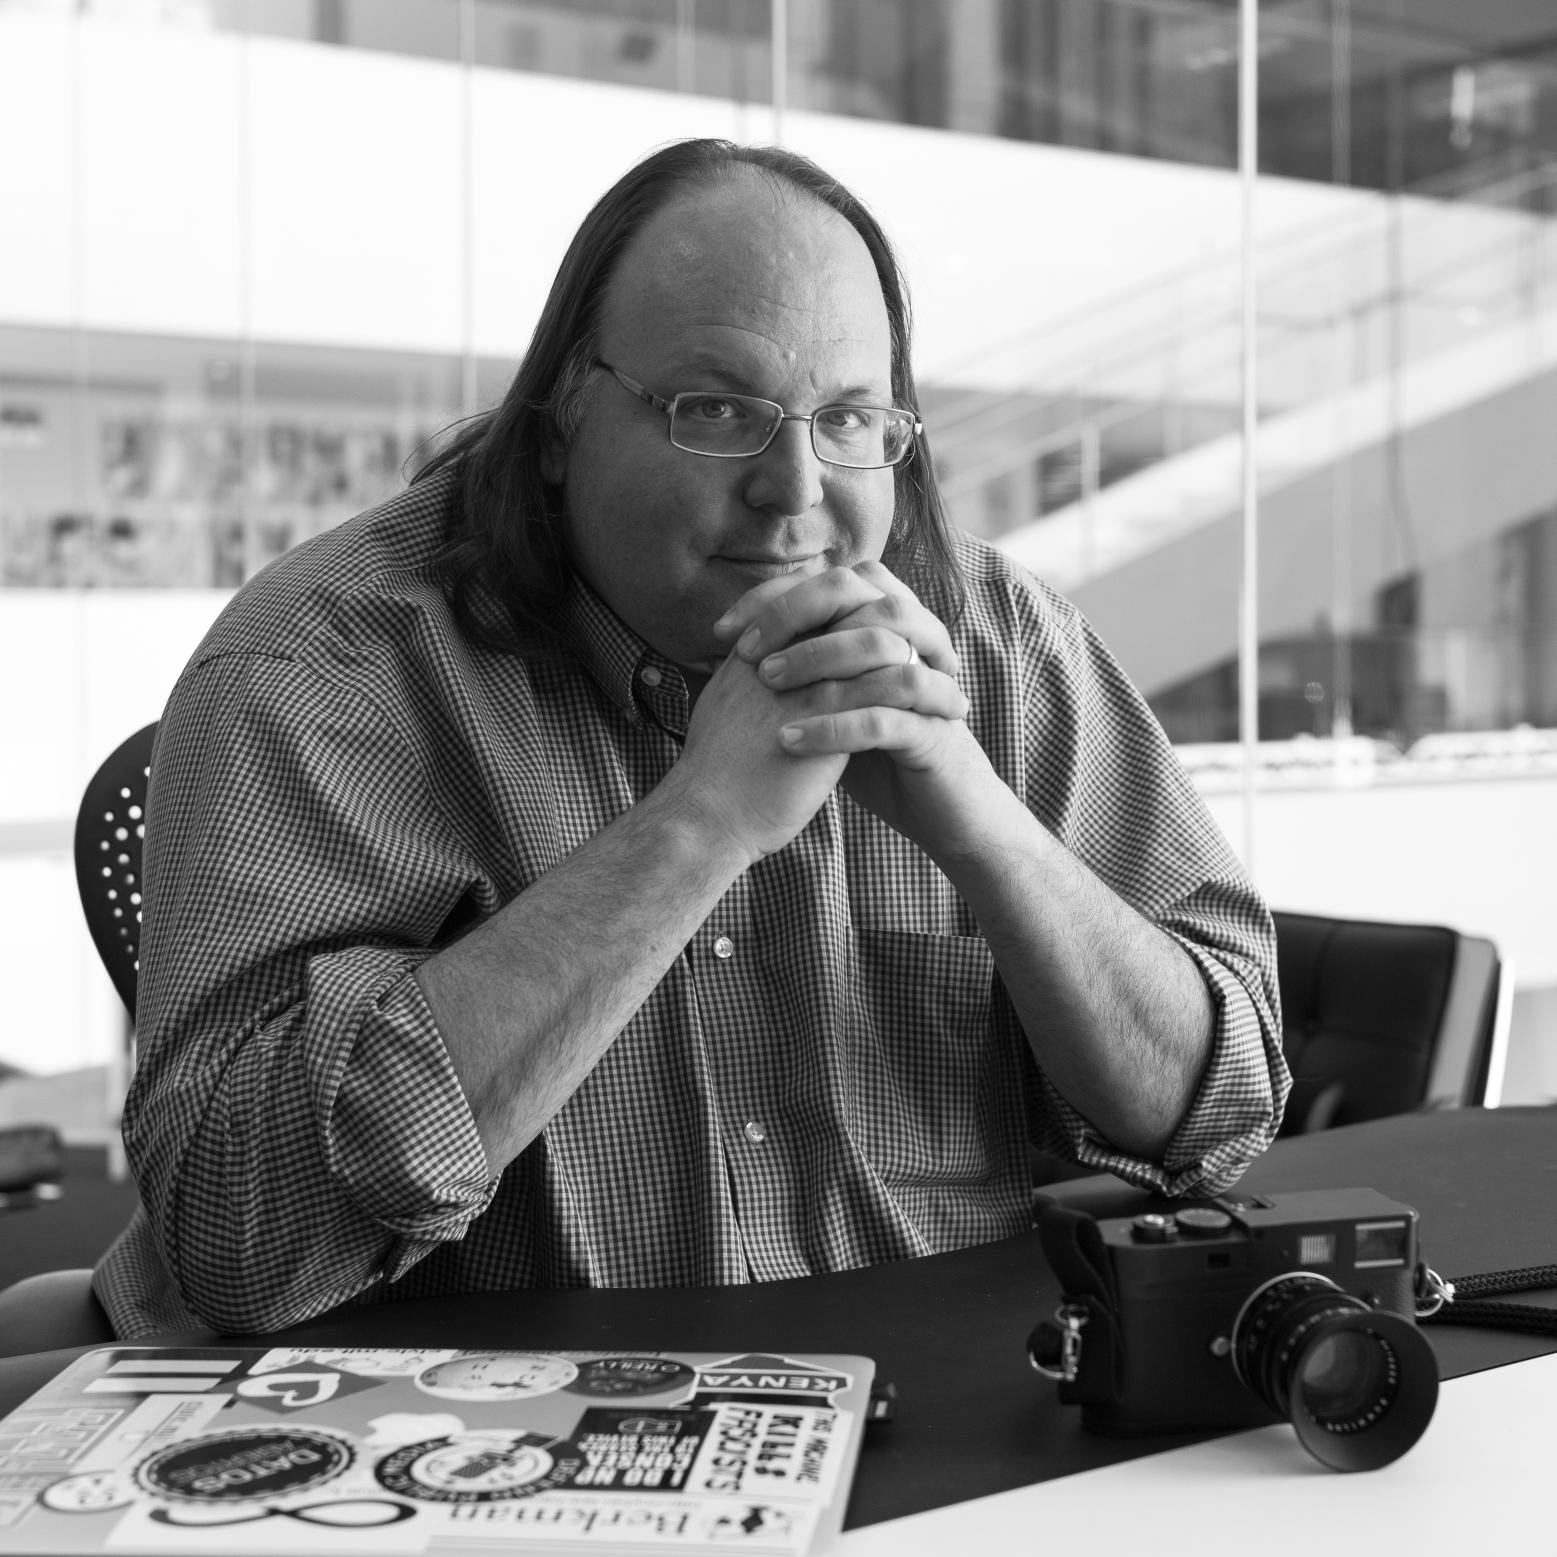 Ethan Zuckerman Bild: Twitter.